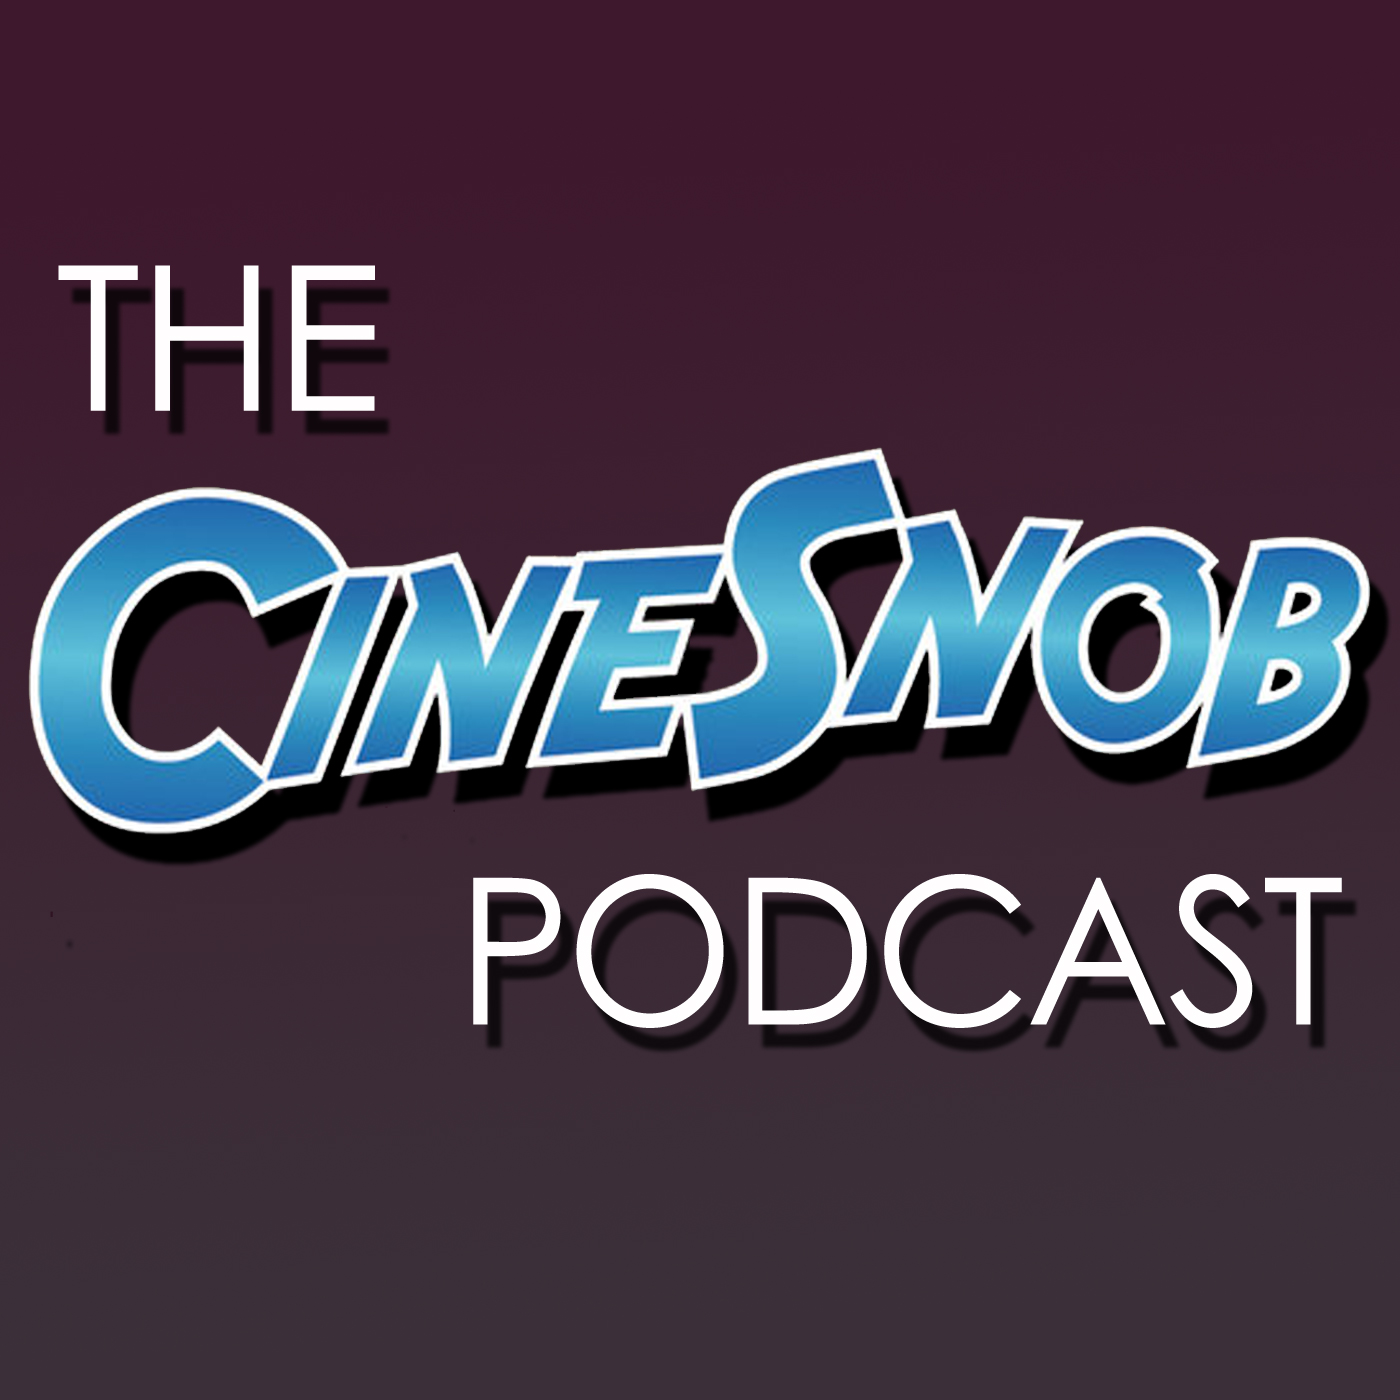 The CineSnob Podcast show art